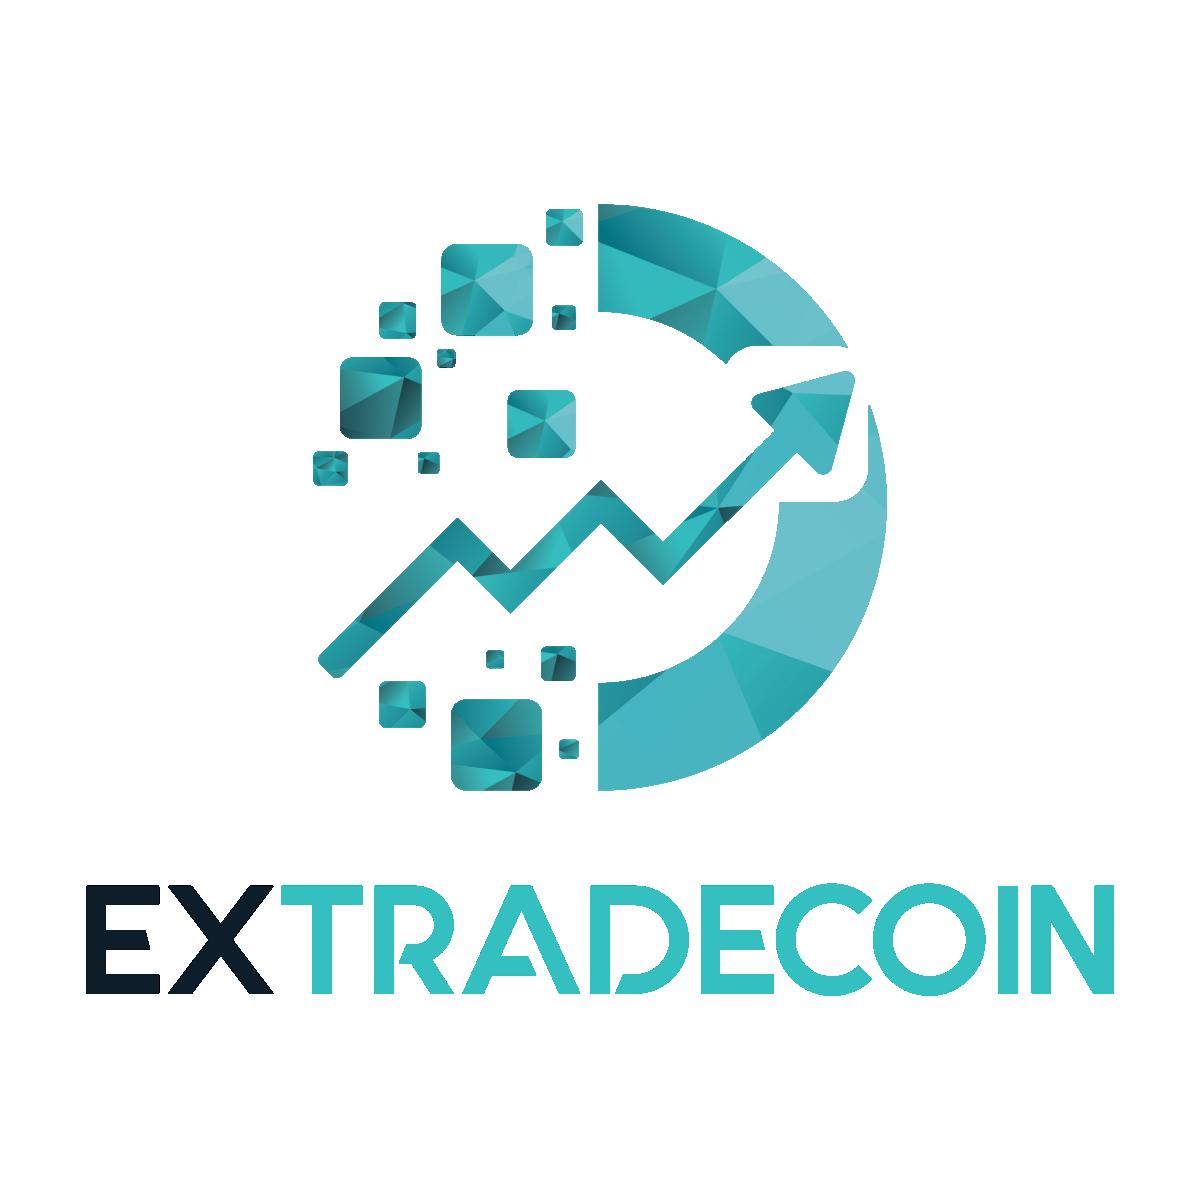 EXTRADECOIN Logo